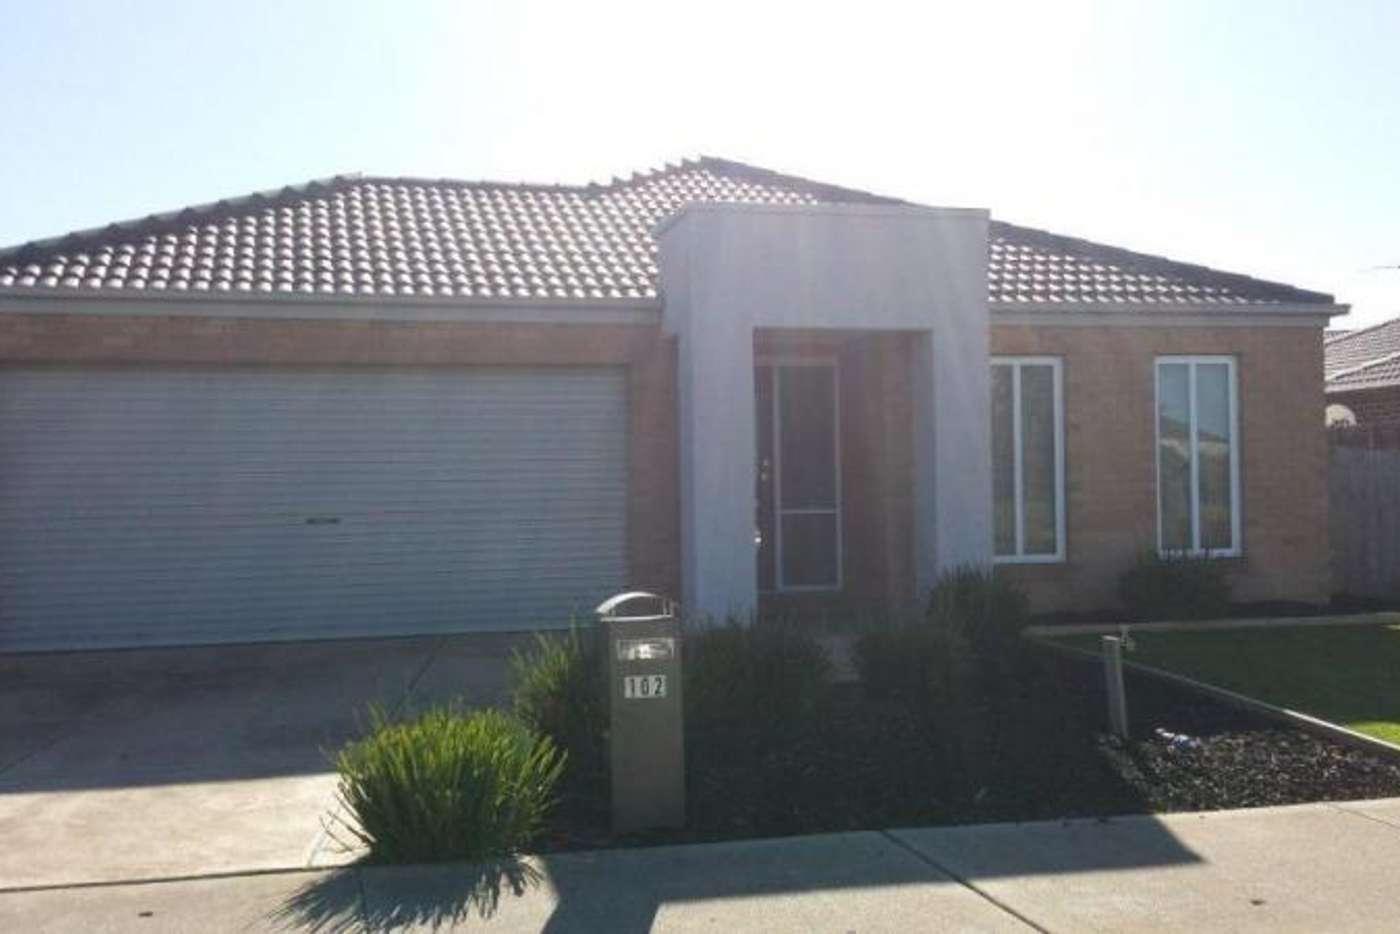 Main view of Homely house listing, 102 Rose Grange Boulevard, Tarneit VIC 3029